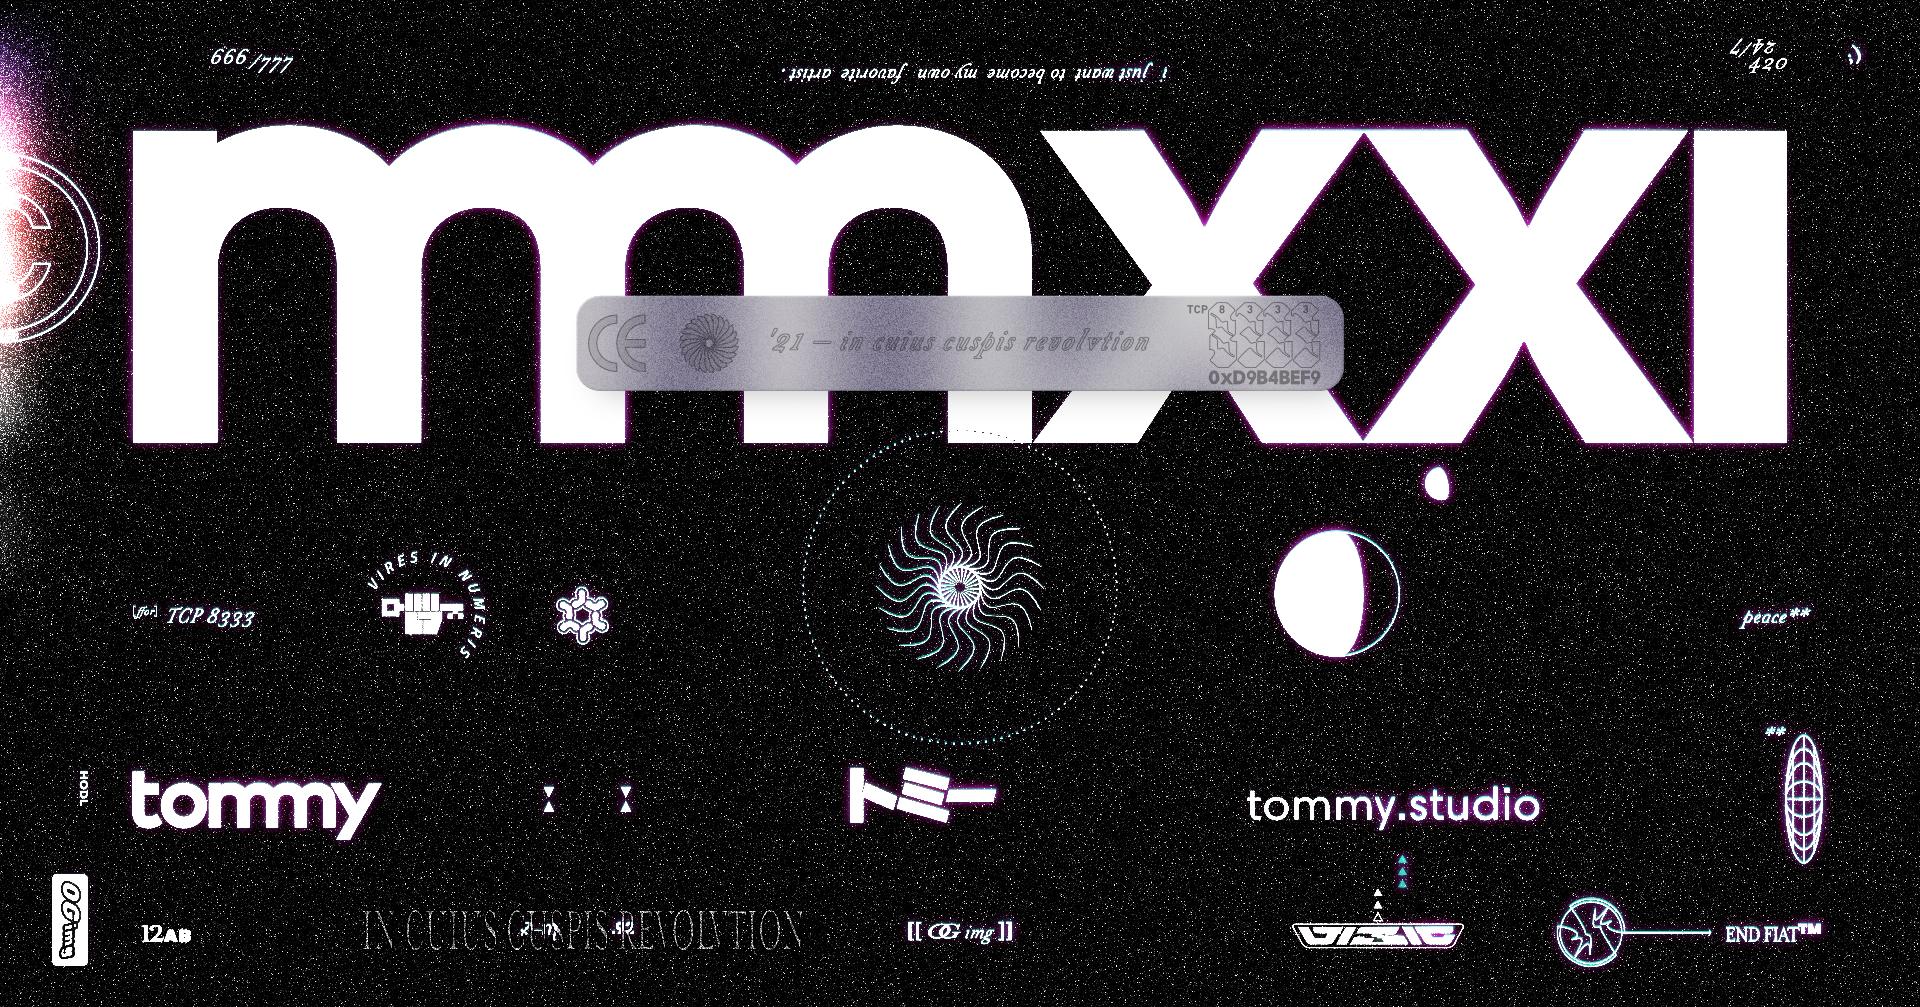 mmxxi ––  tommy Studio (OG img)